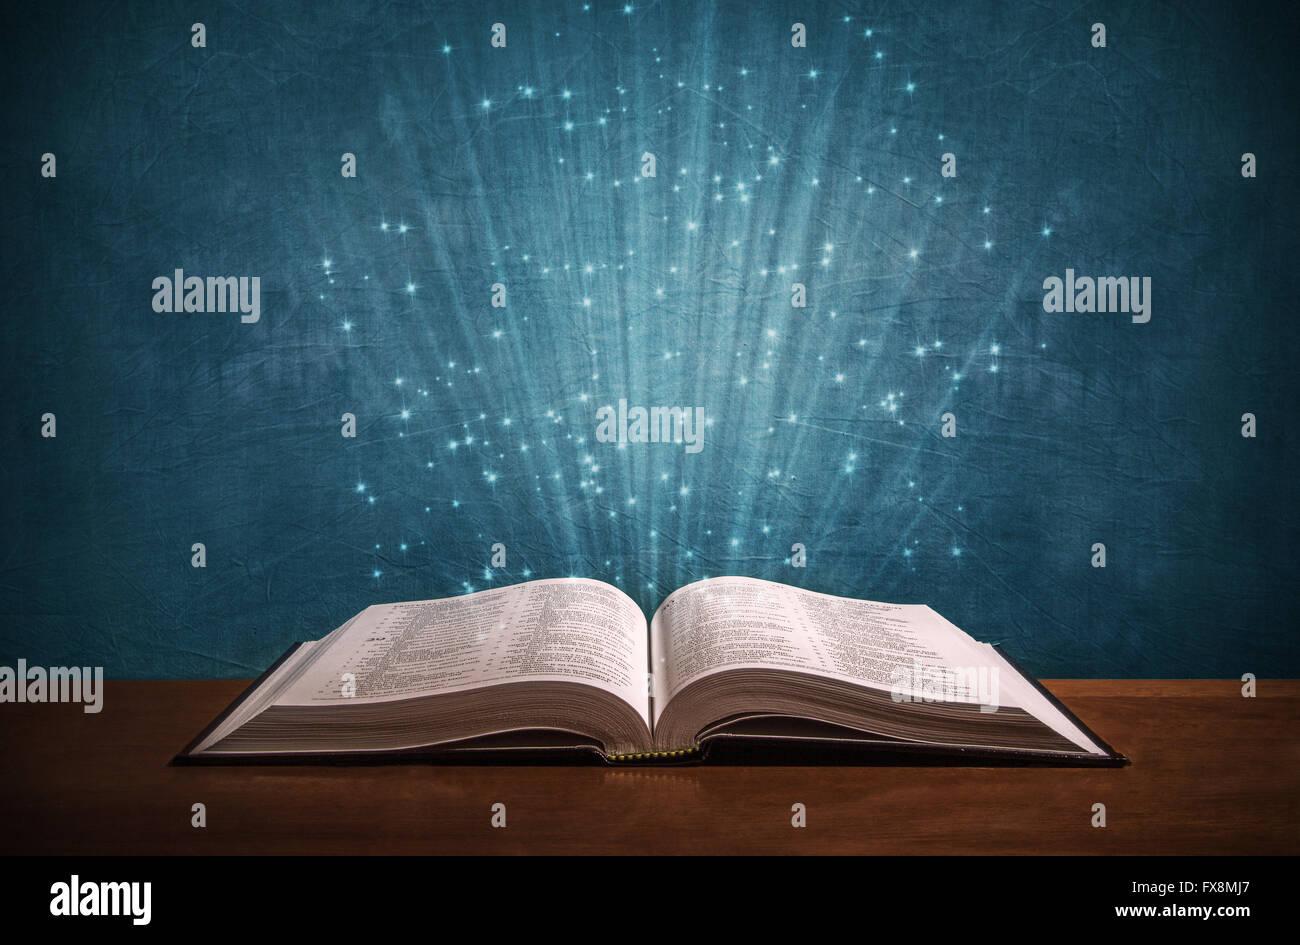 Biblia Abierta Sobre Una Tabla De Madera Concepto De Iglesia Fotografia De Stock Alamy